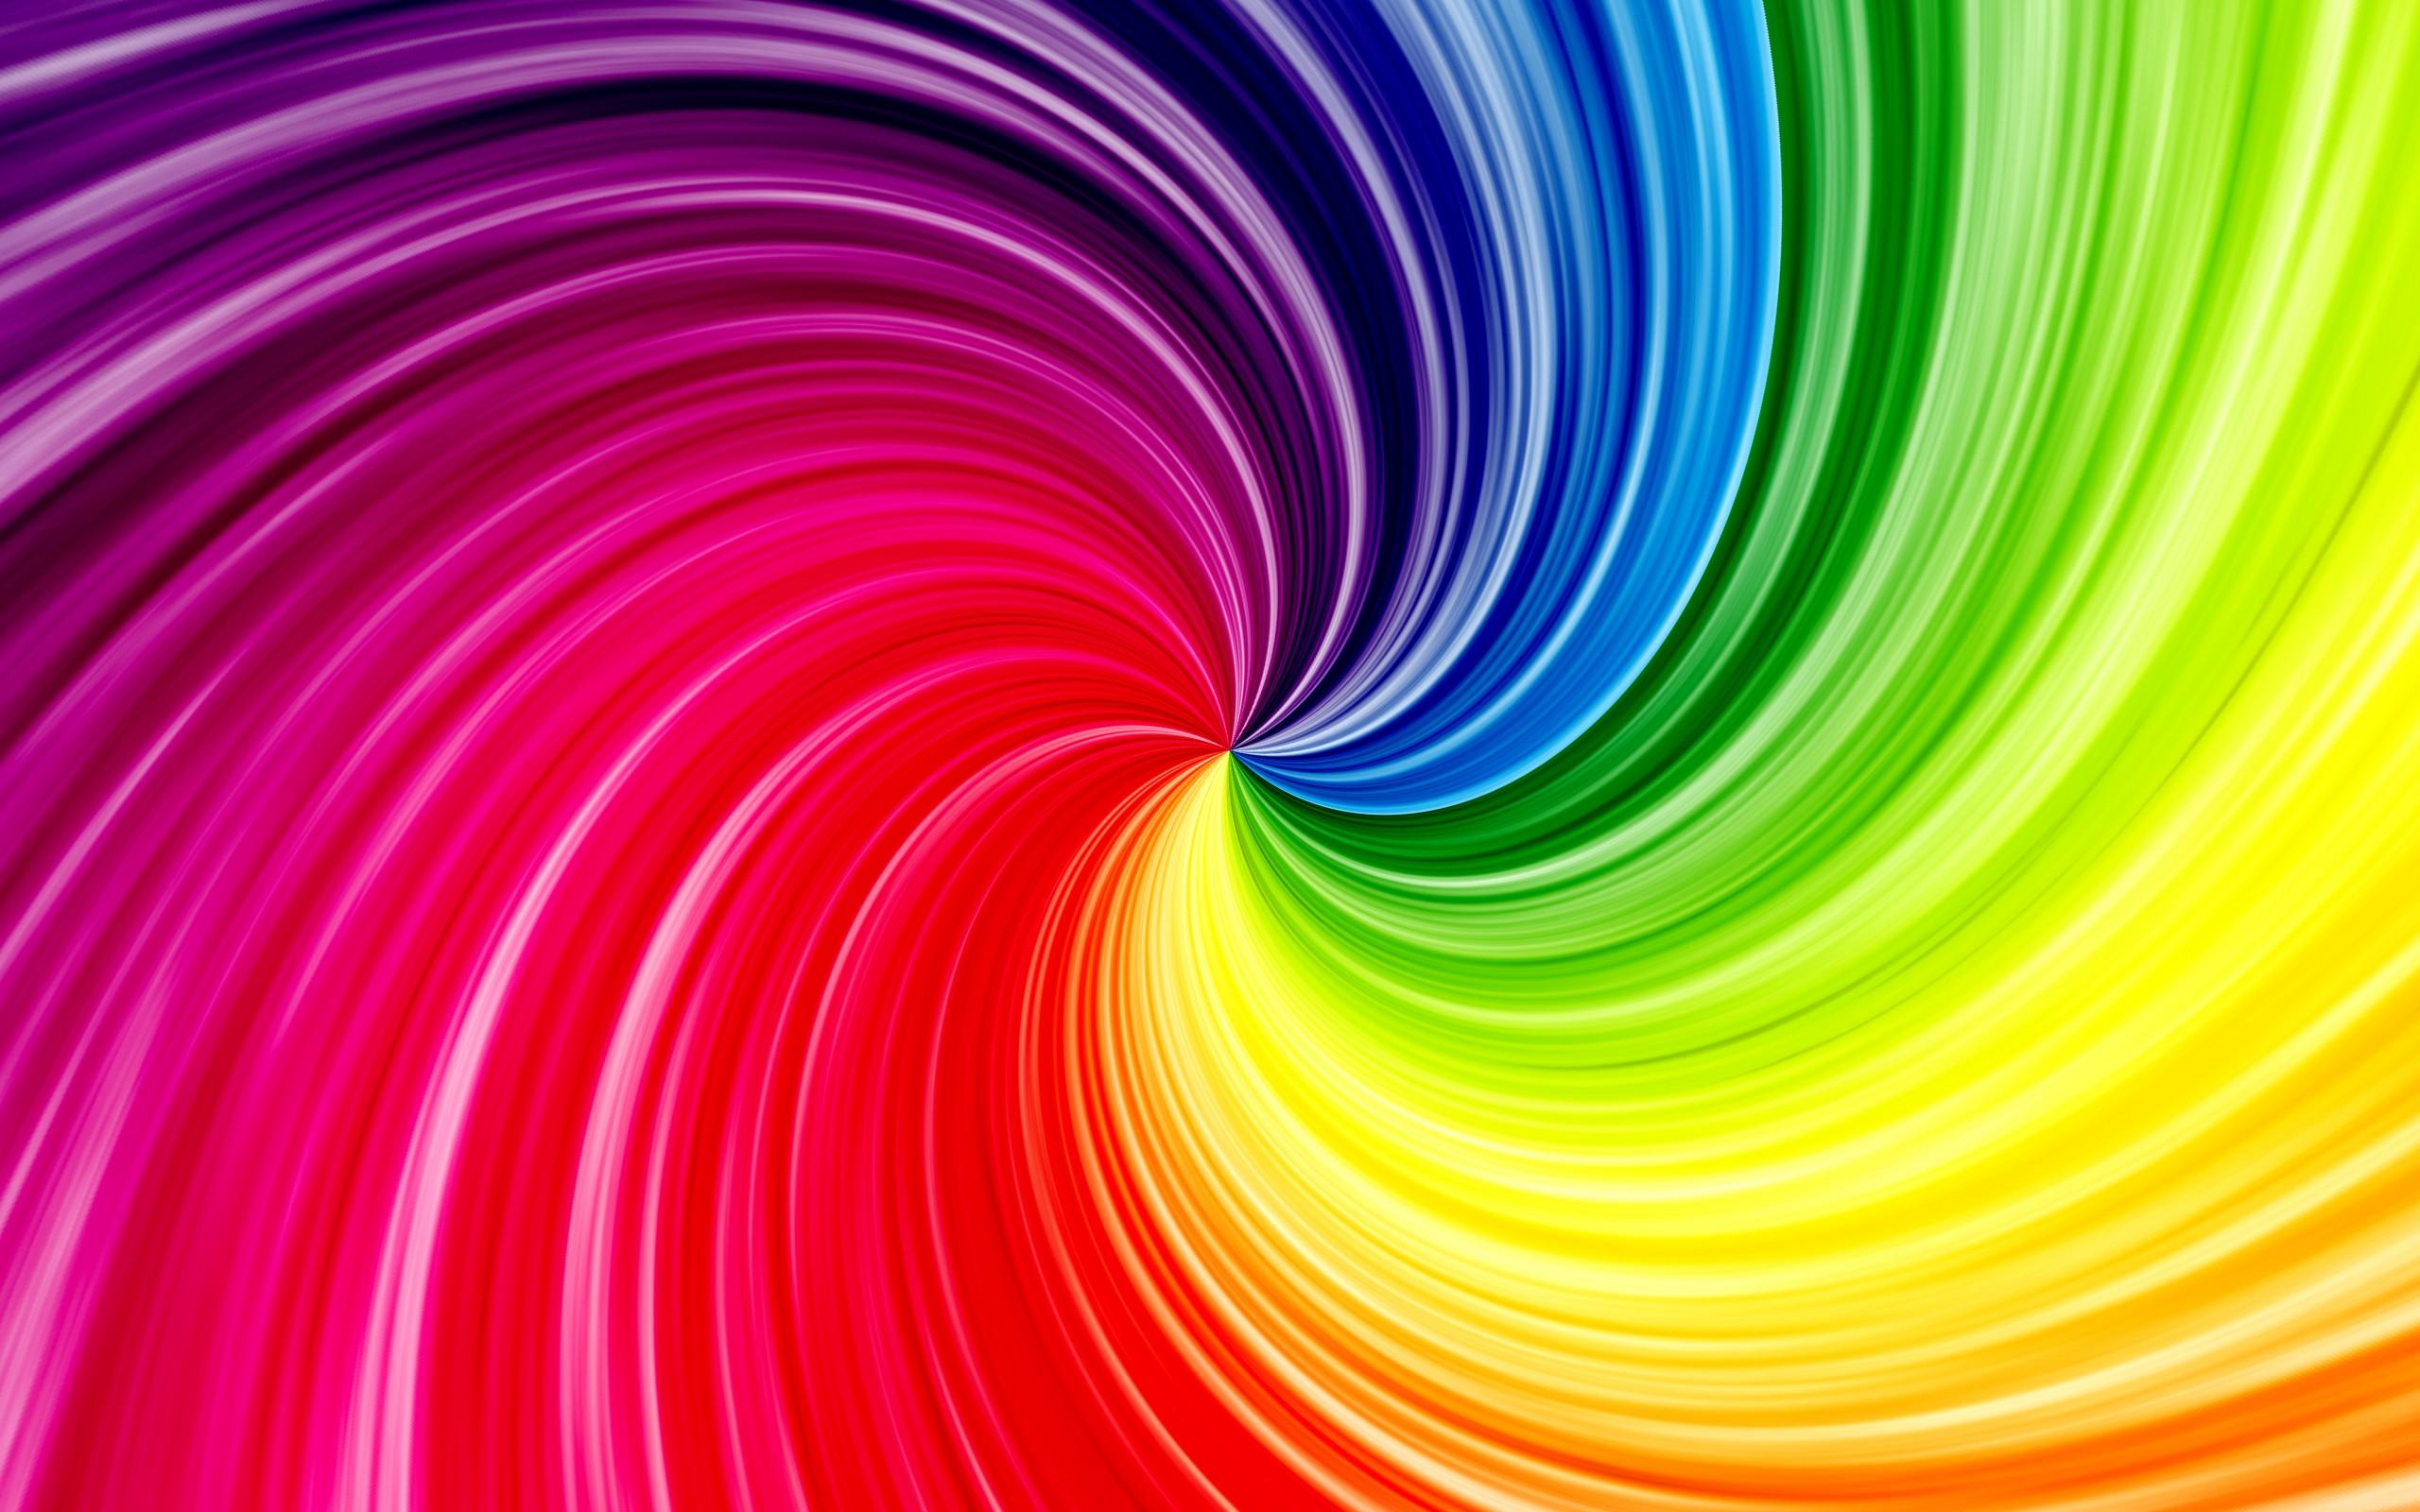 farben full hd wallpaper and hintergrund 2560x1600 id 392066. Black Bedroom Furniture Sets. Home Design Ideas